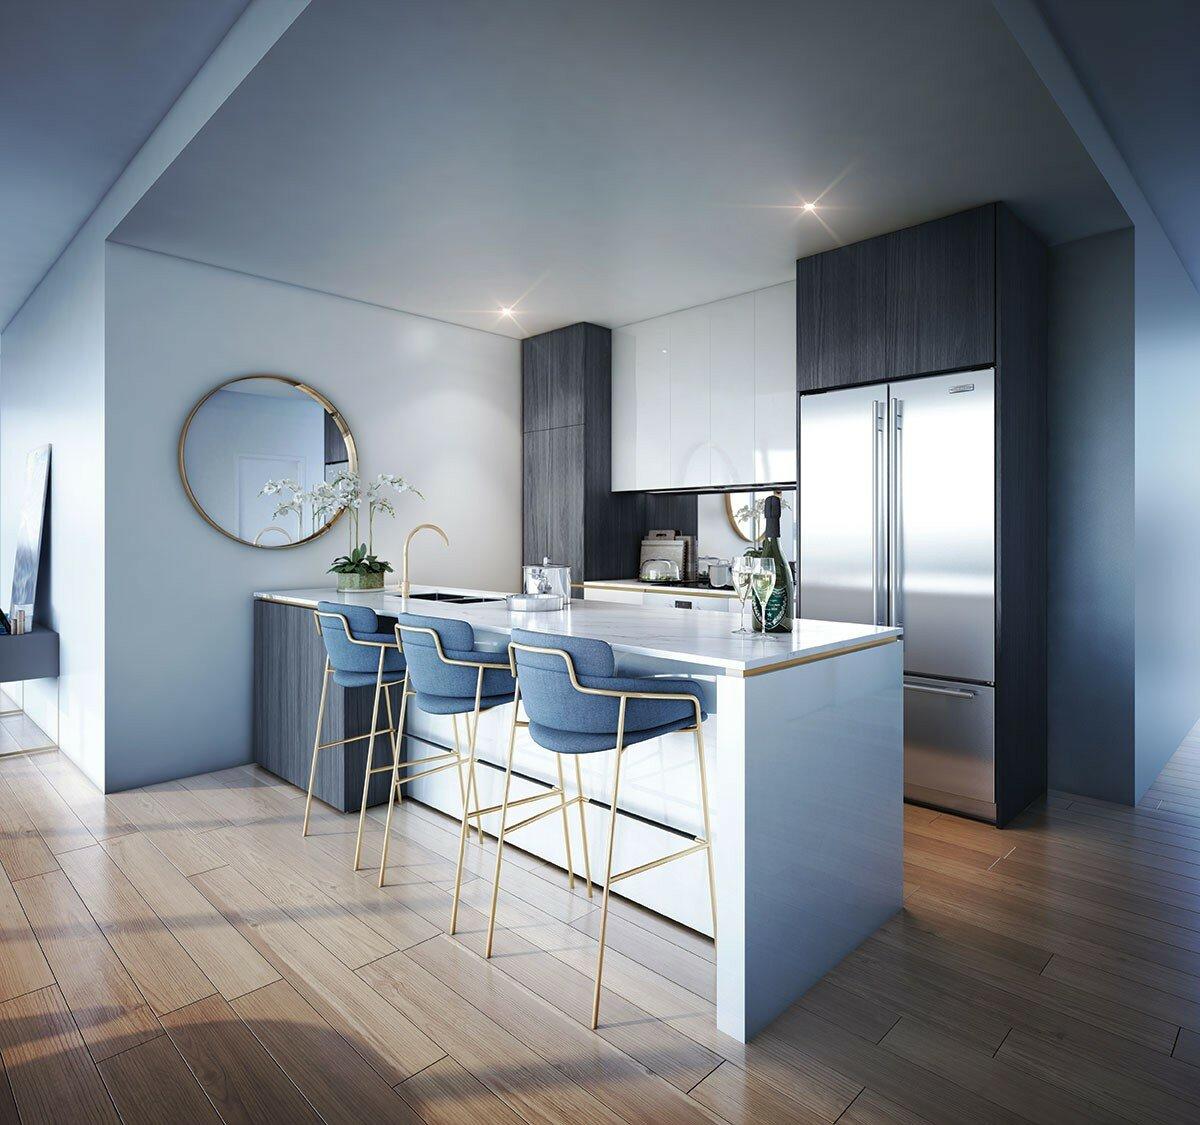 Profile Magazine Online TIR-8 Property Wrap: The Peninsular Residences, Gold Coast